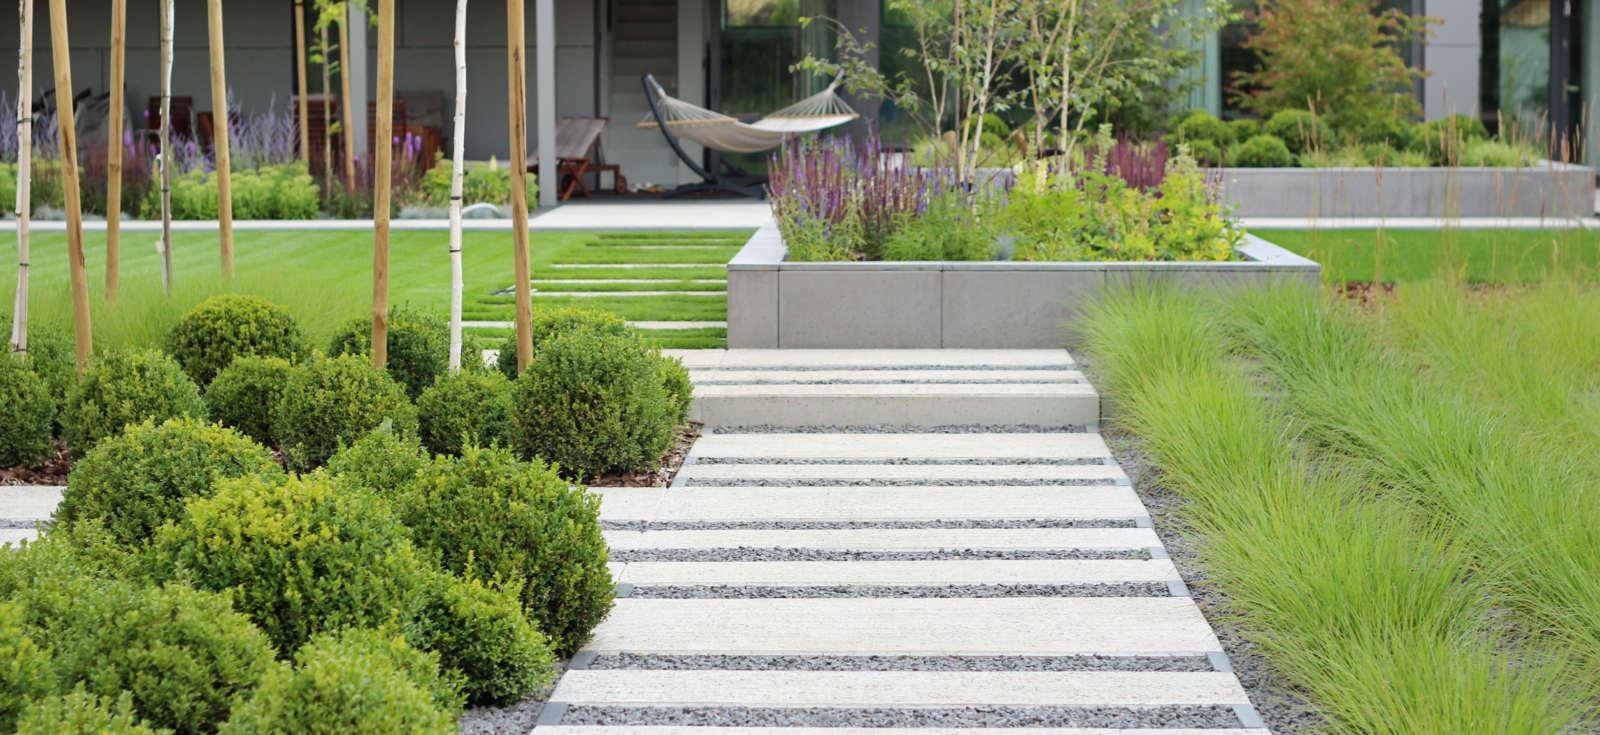 Zahradní architekt praha pro moderne zahrady v Praze návrhovaní zahrad